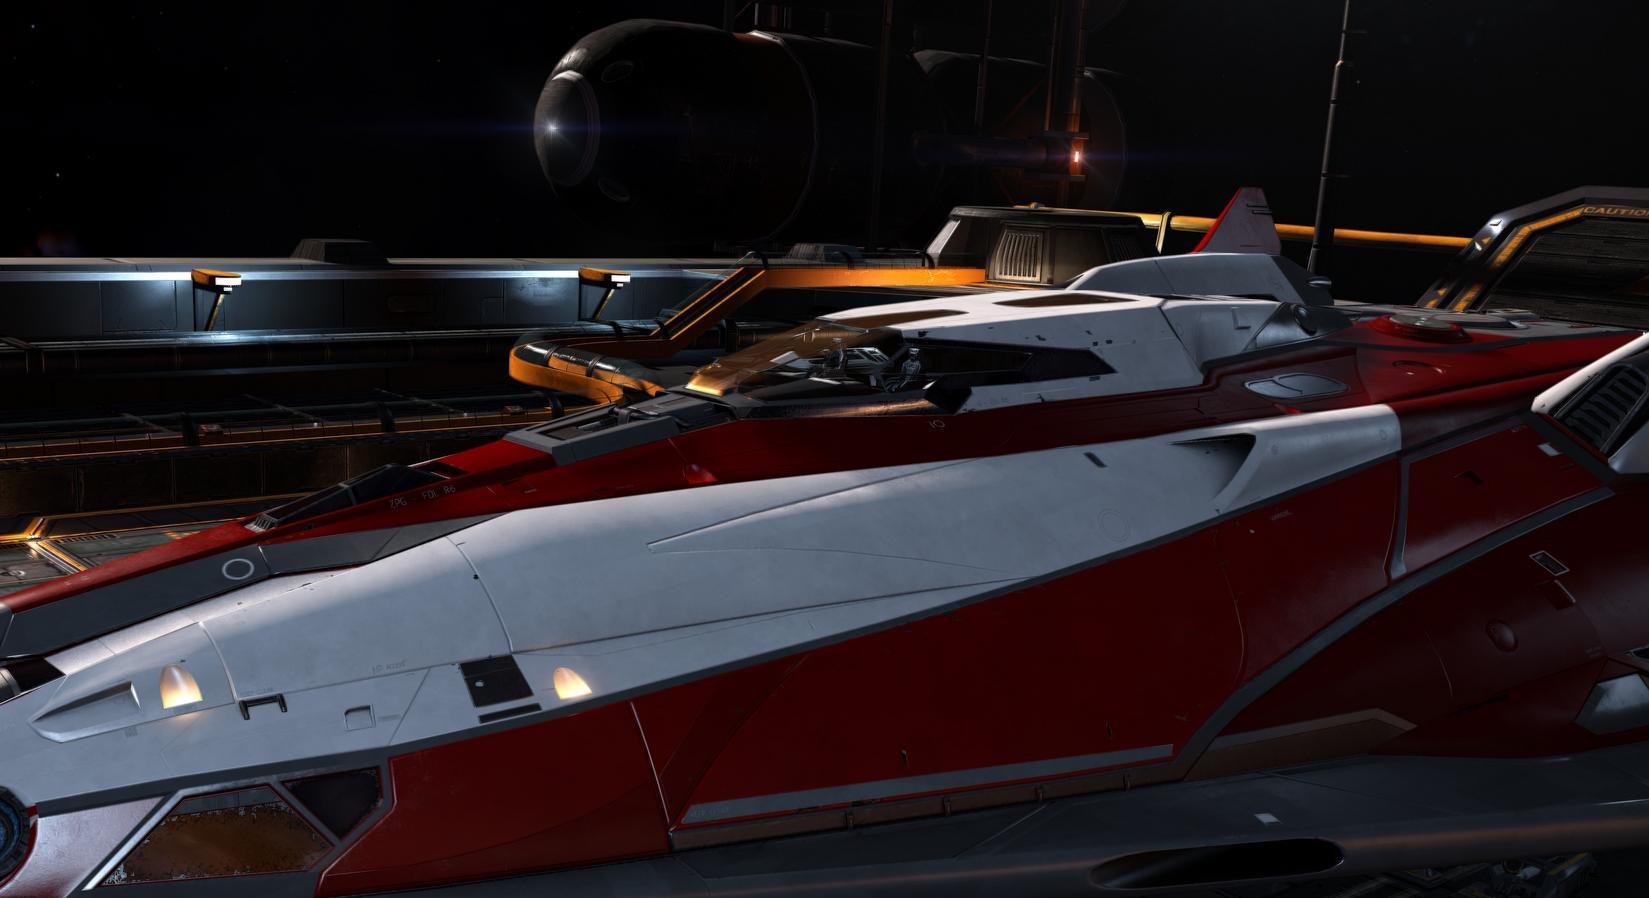 Zorgon Ship | www.gall...